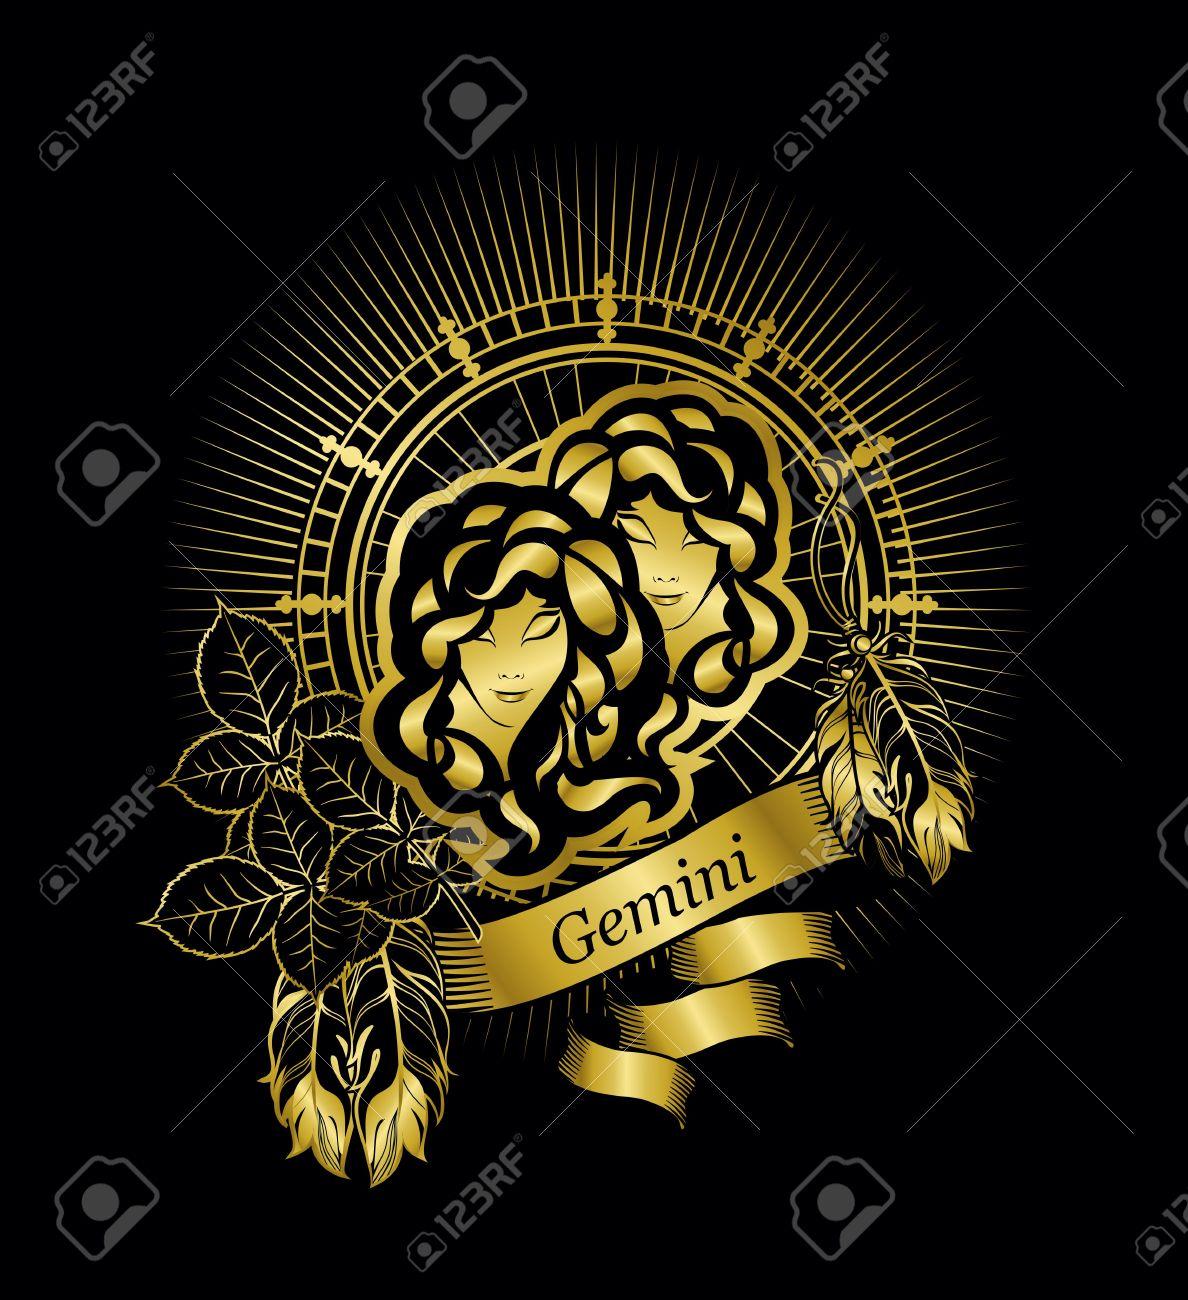 Astrological sign of the zodiac gemini two girls in a circular astrological sign of the zodiac gemini two girls in a circular shape in gold on a buycottarizona